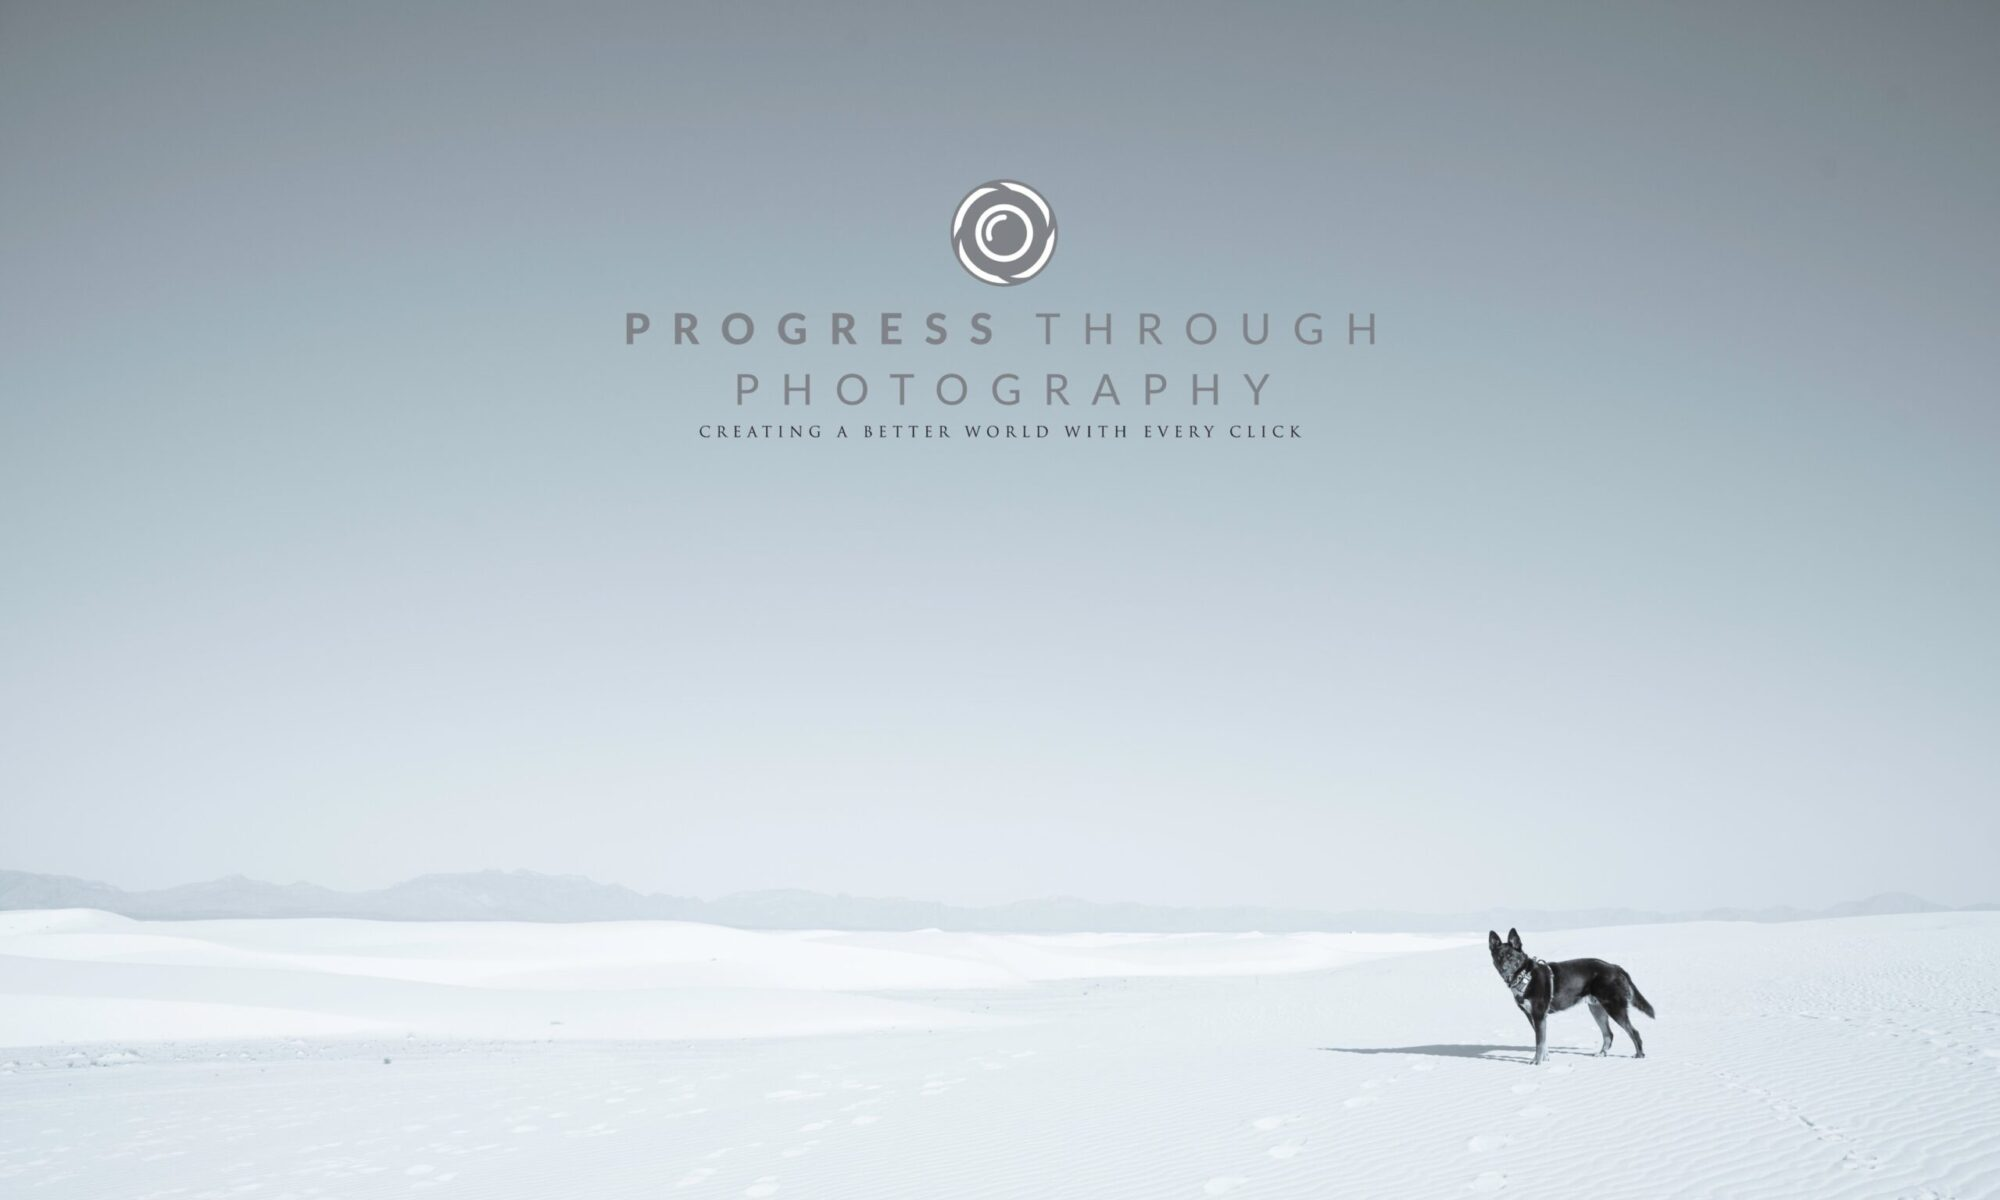 Progress Through Photography